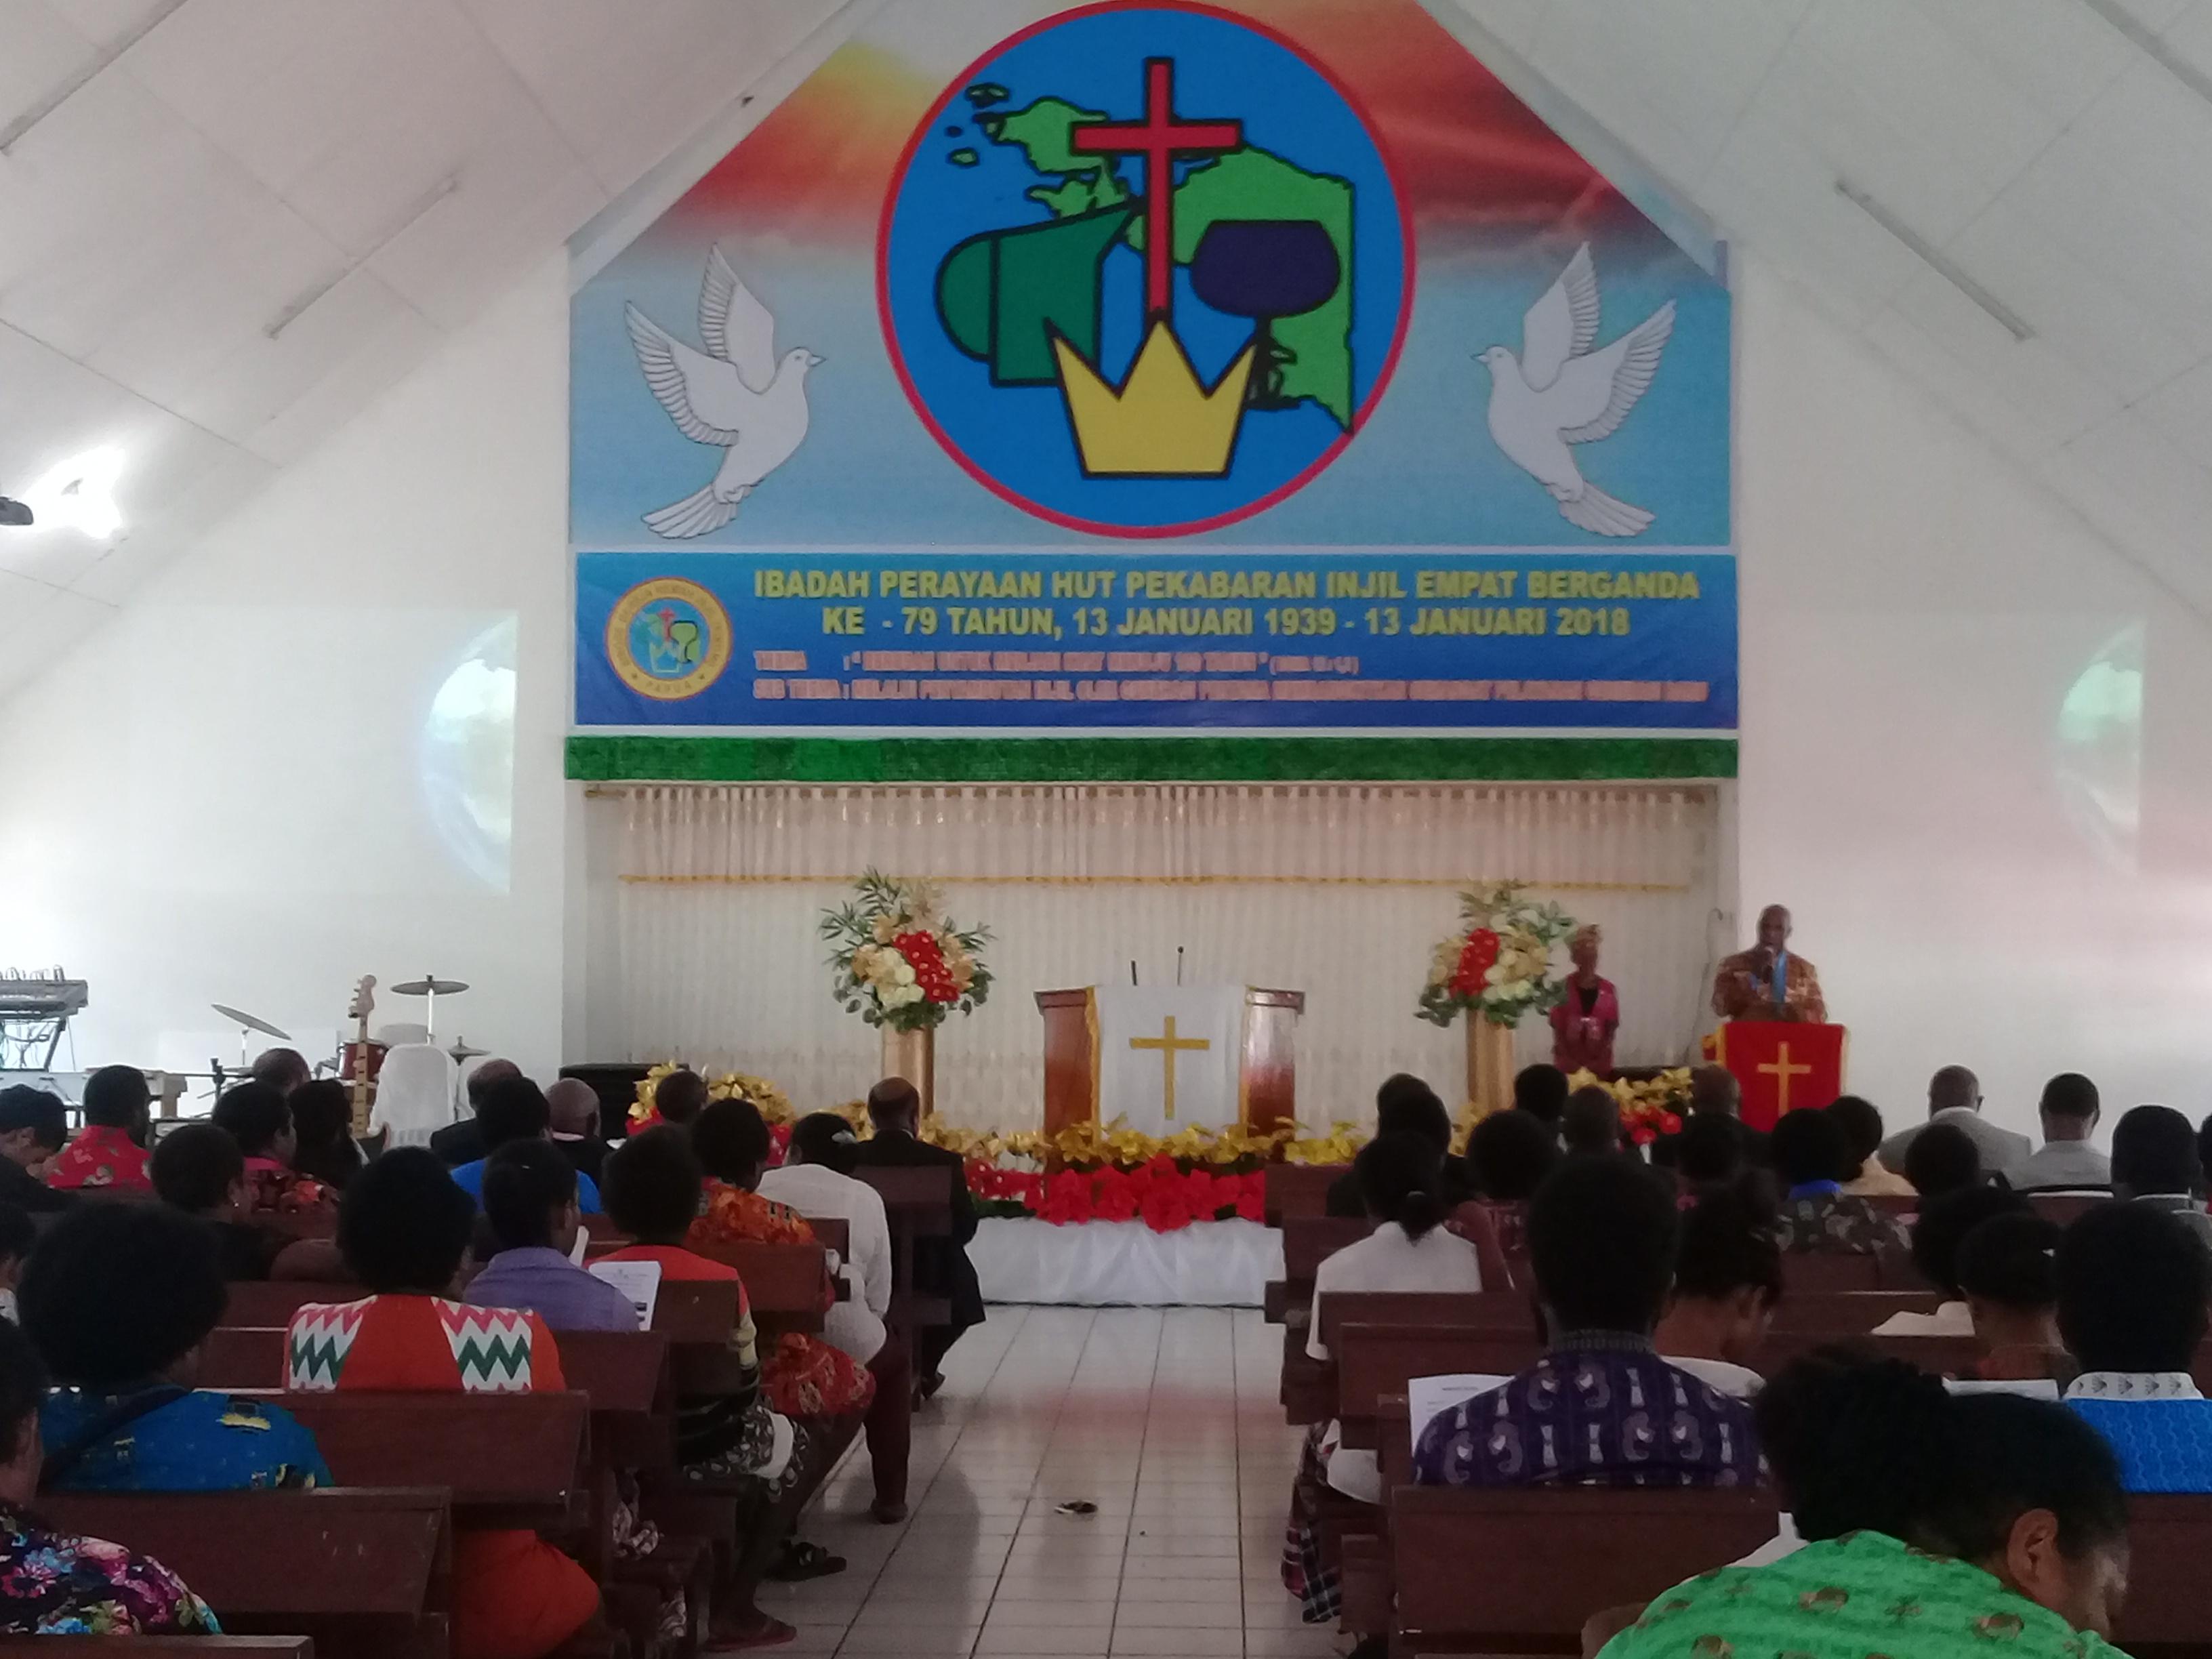 Jemaat Gereja Kingmi Eklesia Rayakan  Hut Pekabaran Injil Berganda Ke 79 Tahun